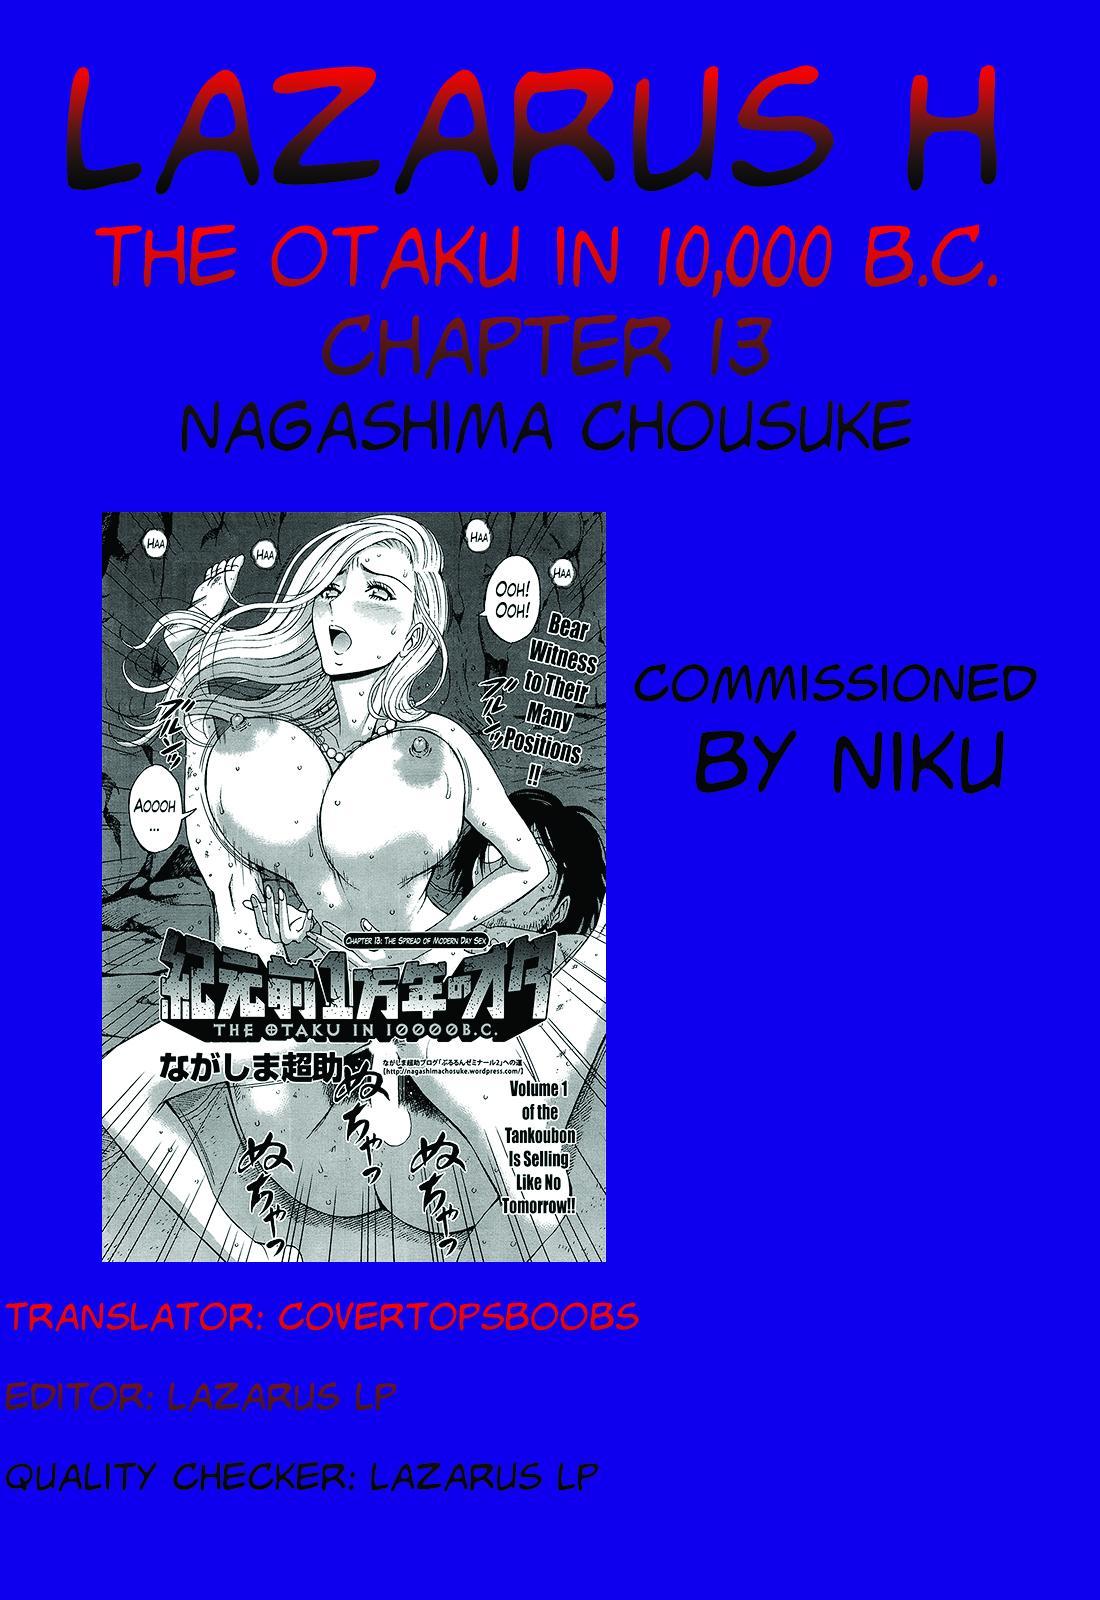 Kigenzen 10000 Nen no Ota   The Otaku in 10,000 B.C. Ch. 1-22 252